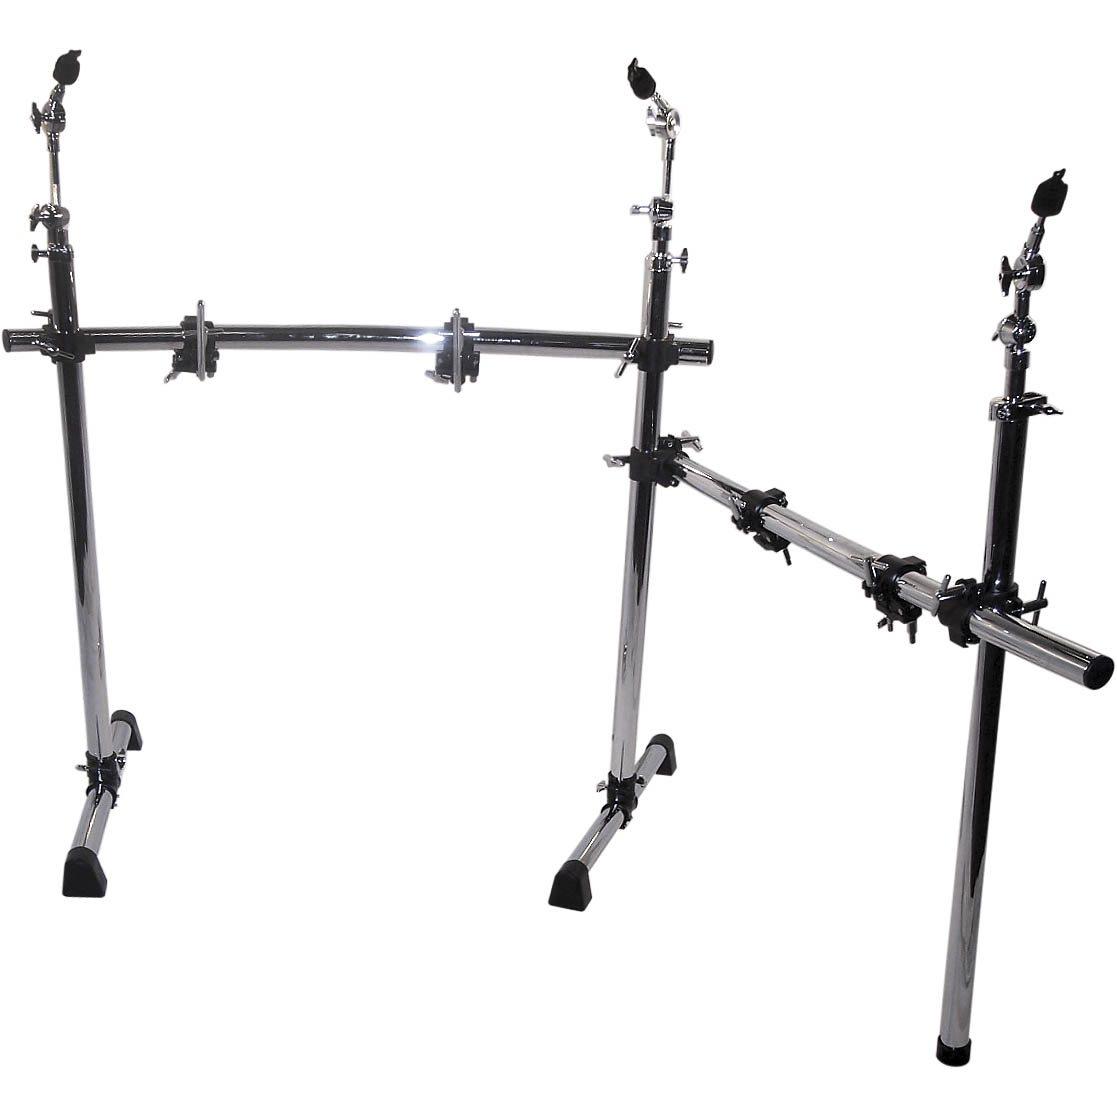 Pintech 7001 Drum Rack